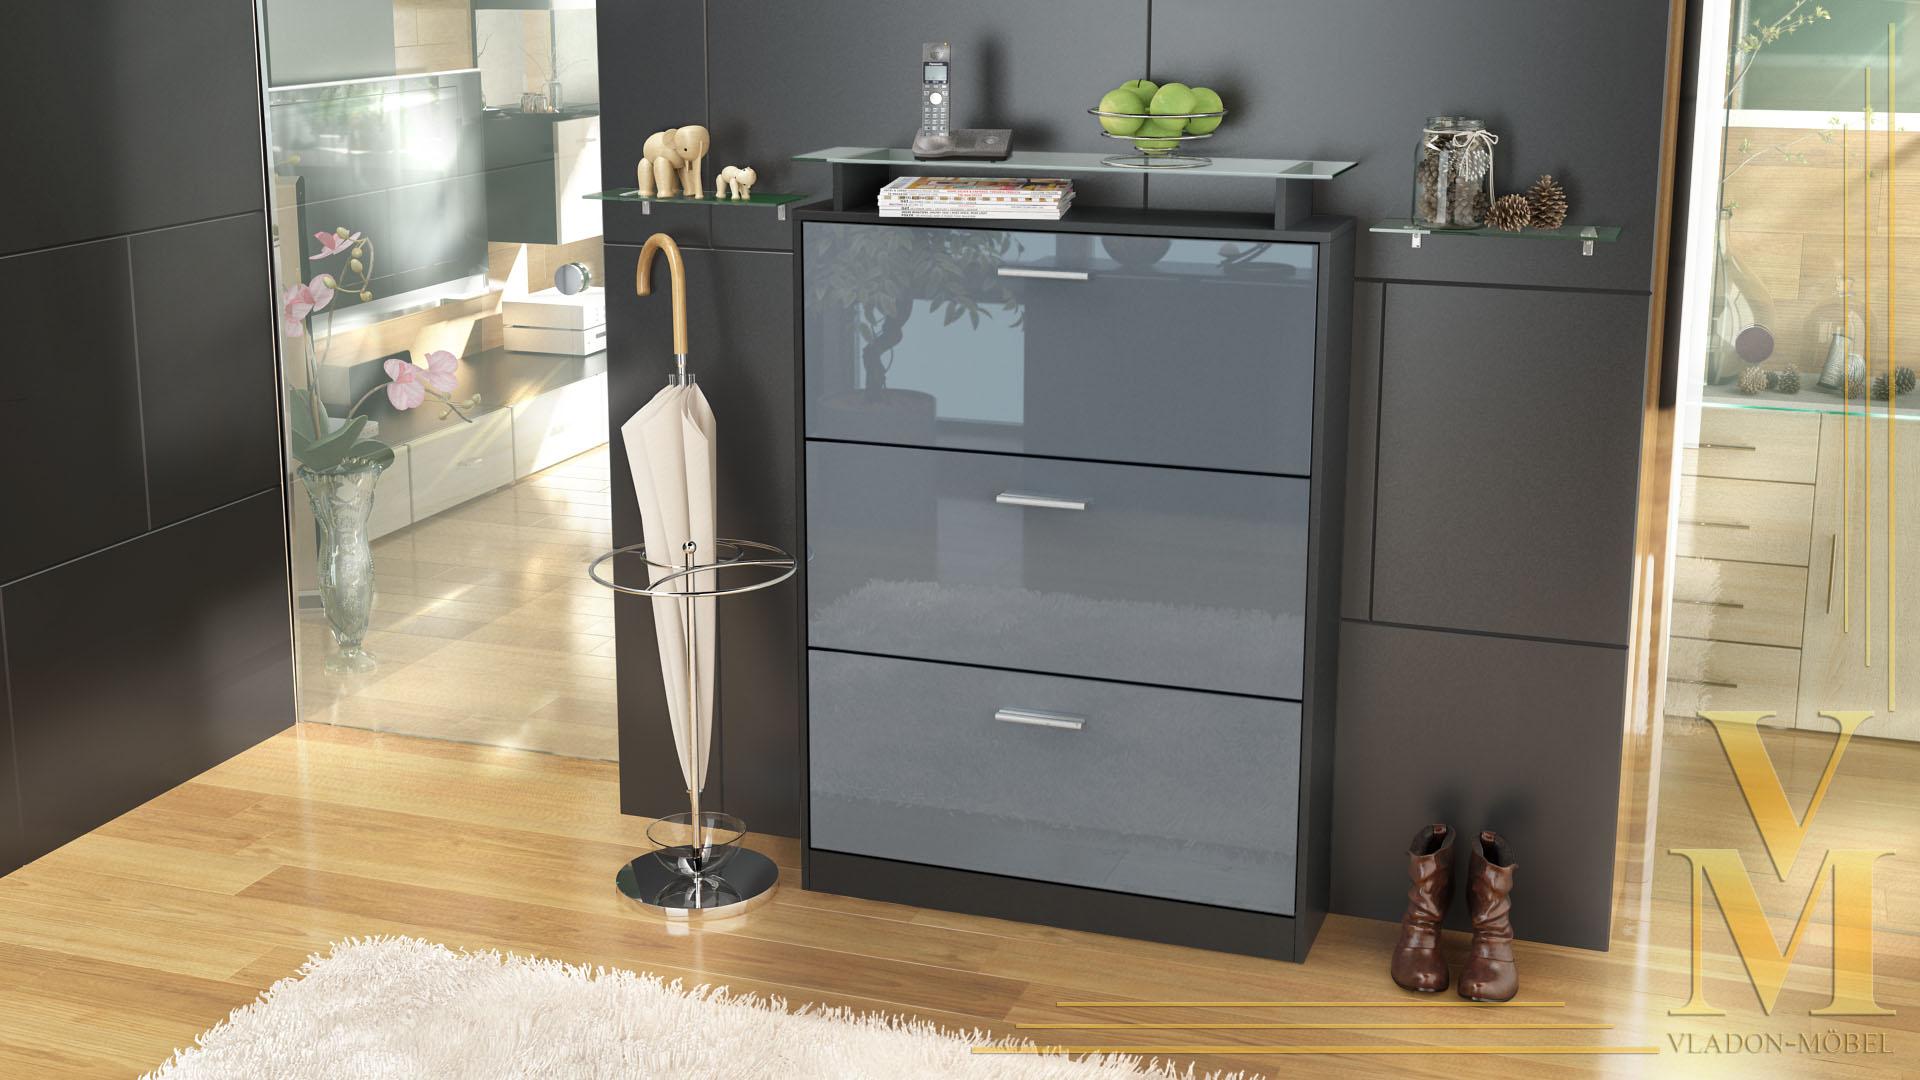 schuhschrank schuhkipper diele flur schrank lavia schwarz. Black Bedroom Furniture Sets. Home Design Ideas